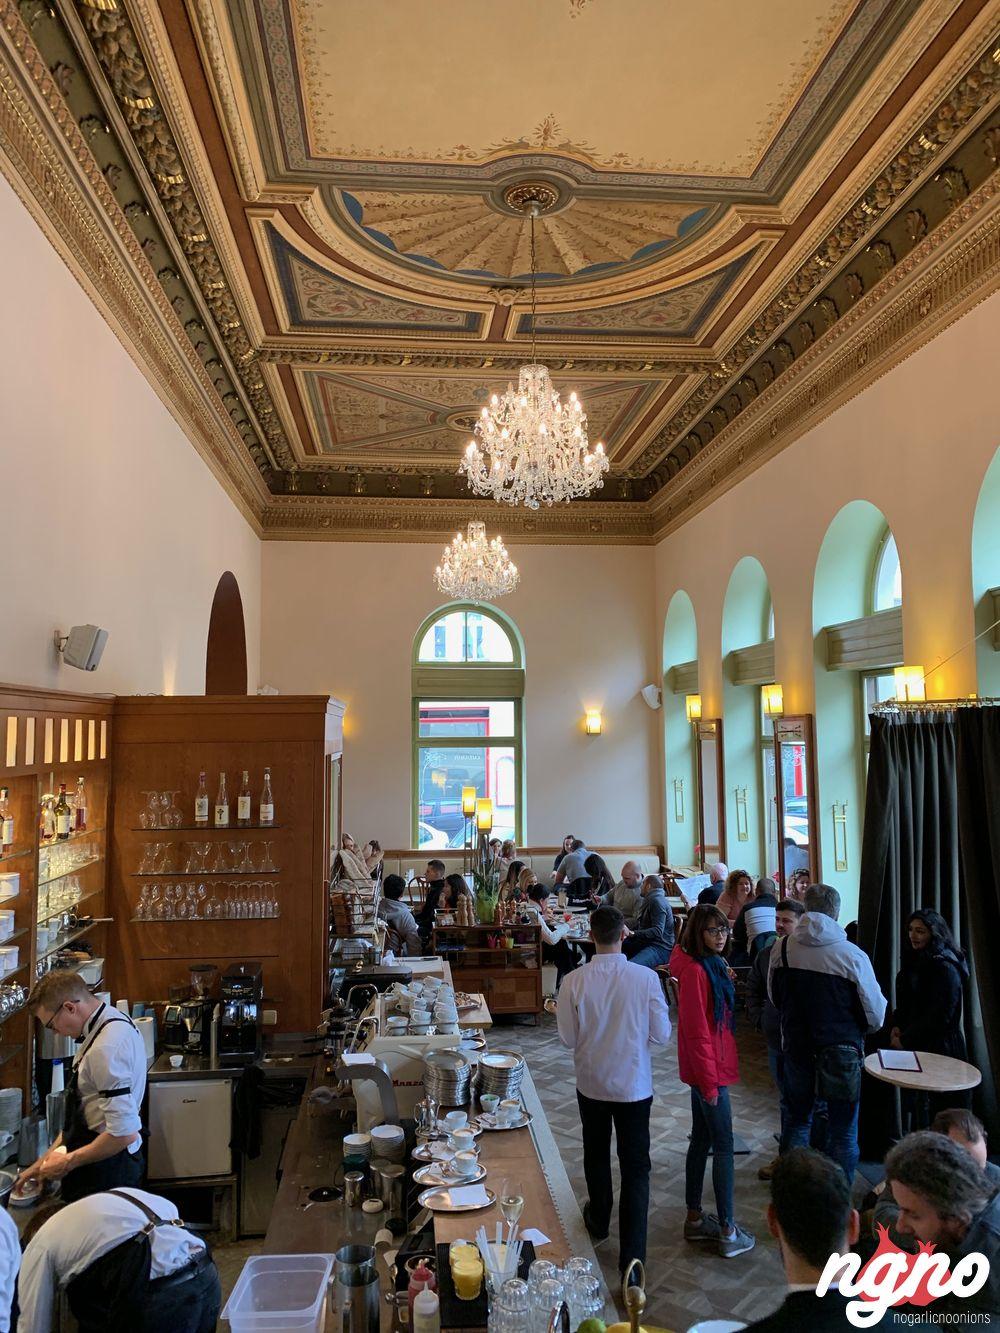 cafe-savoy-prague-nogarlicnoonions-302019-01-20-10-41-04